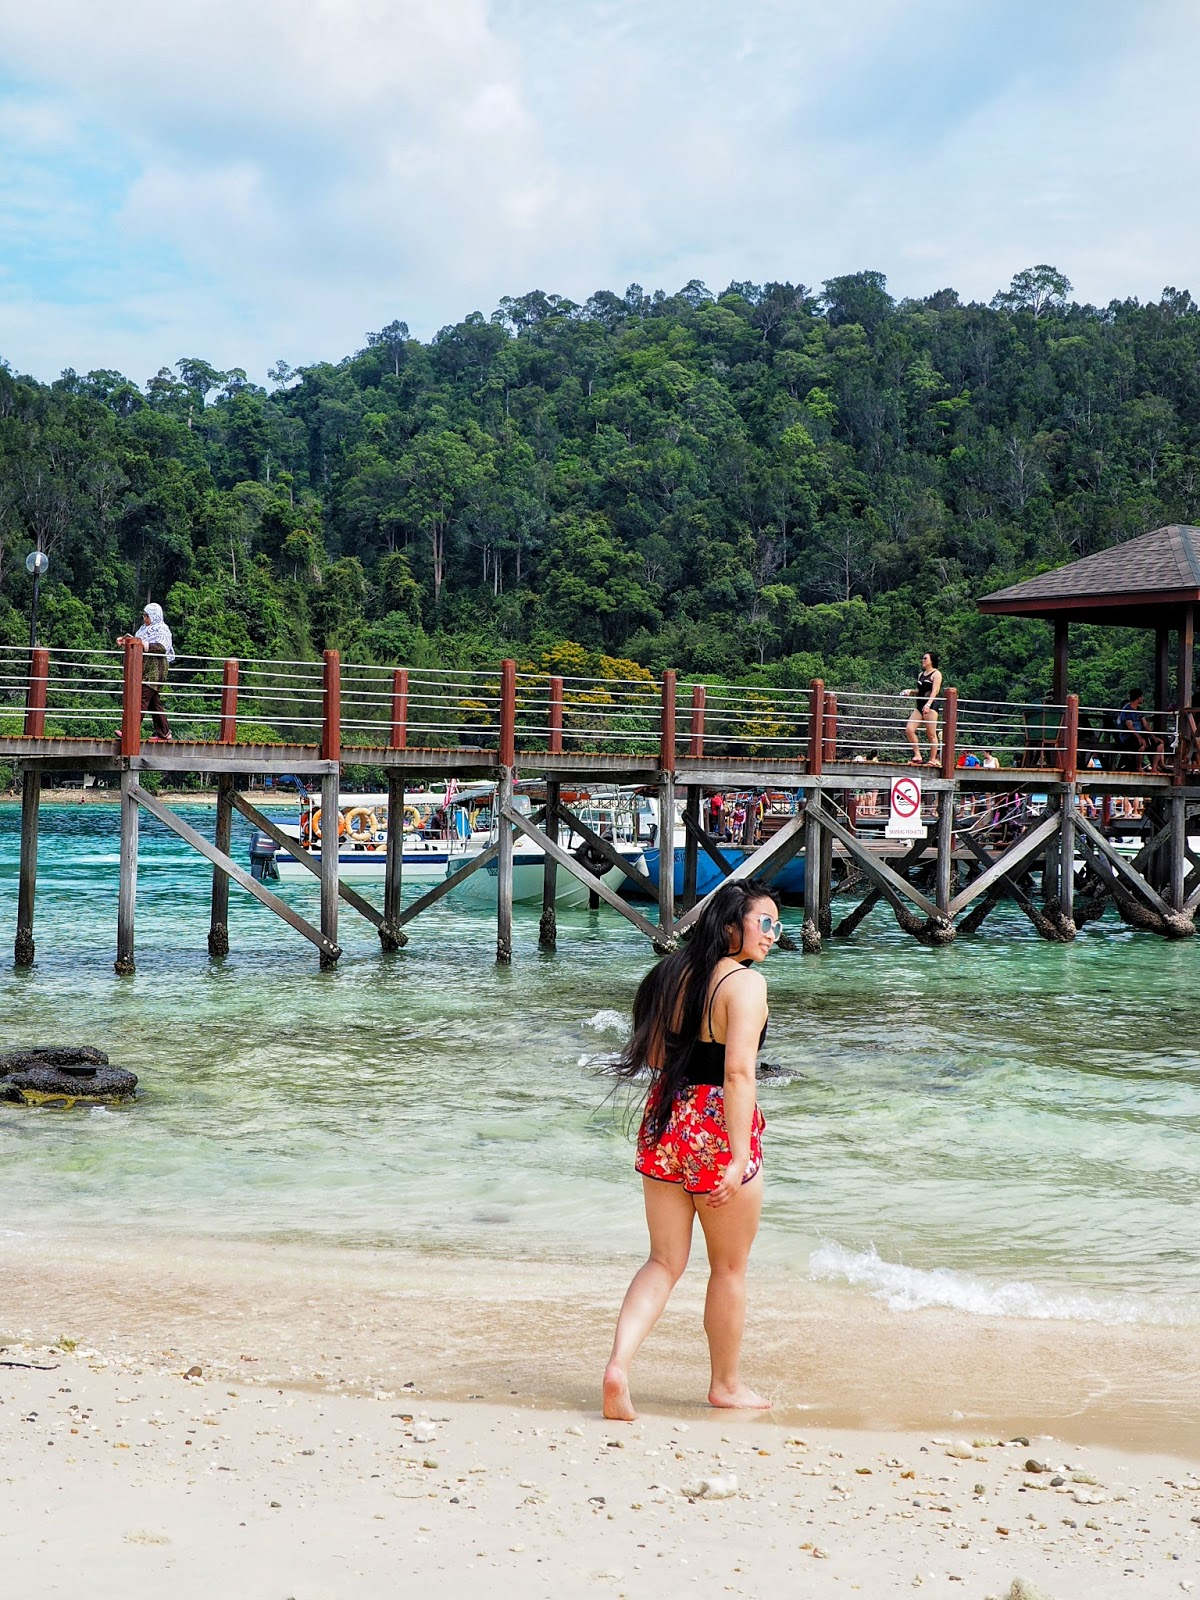 Island Kota Kinabalu tropical vacation malaysia sabah borneo outfit